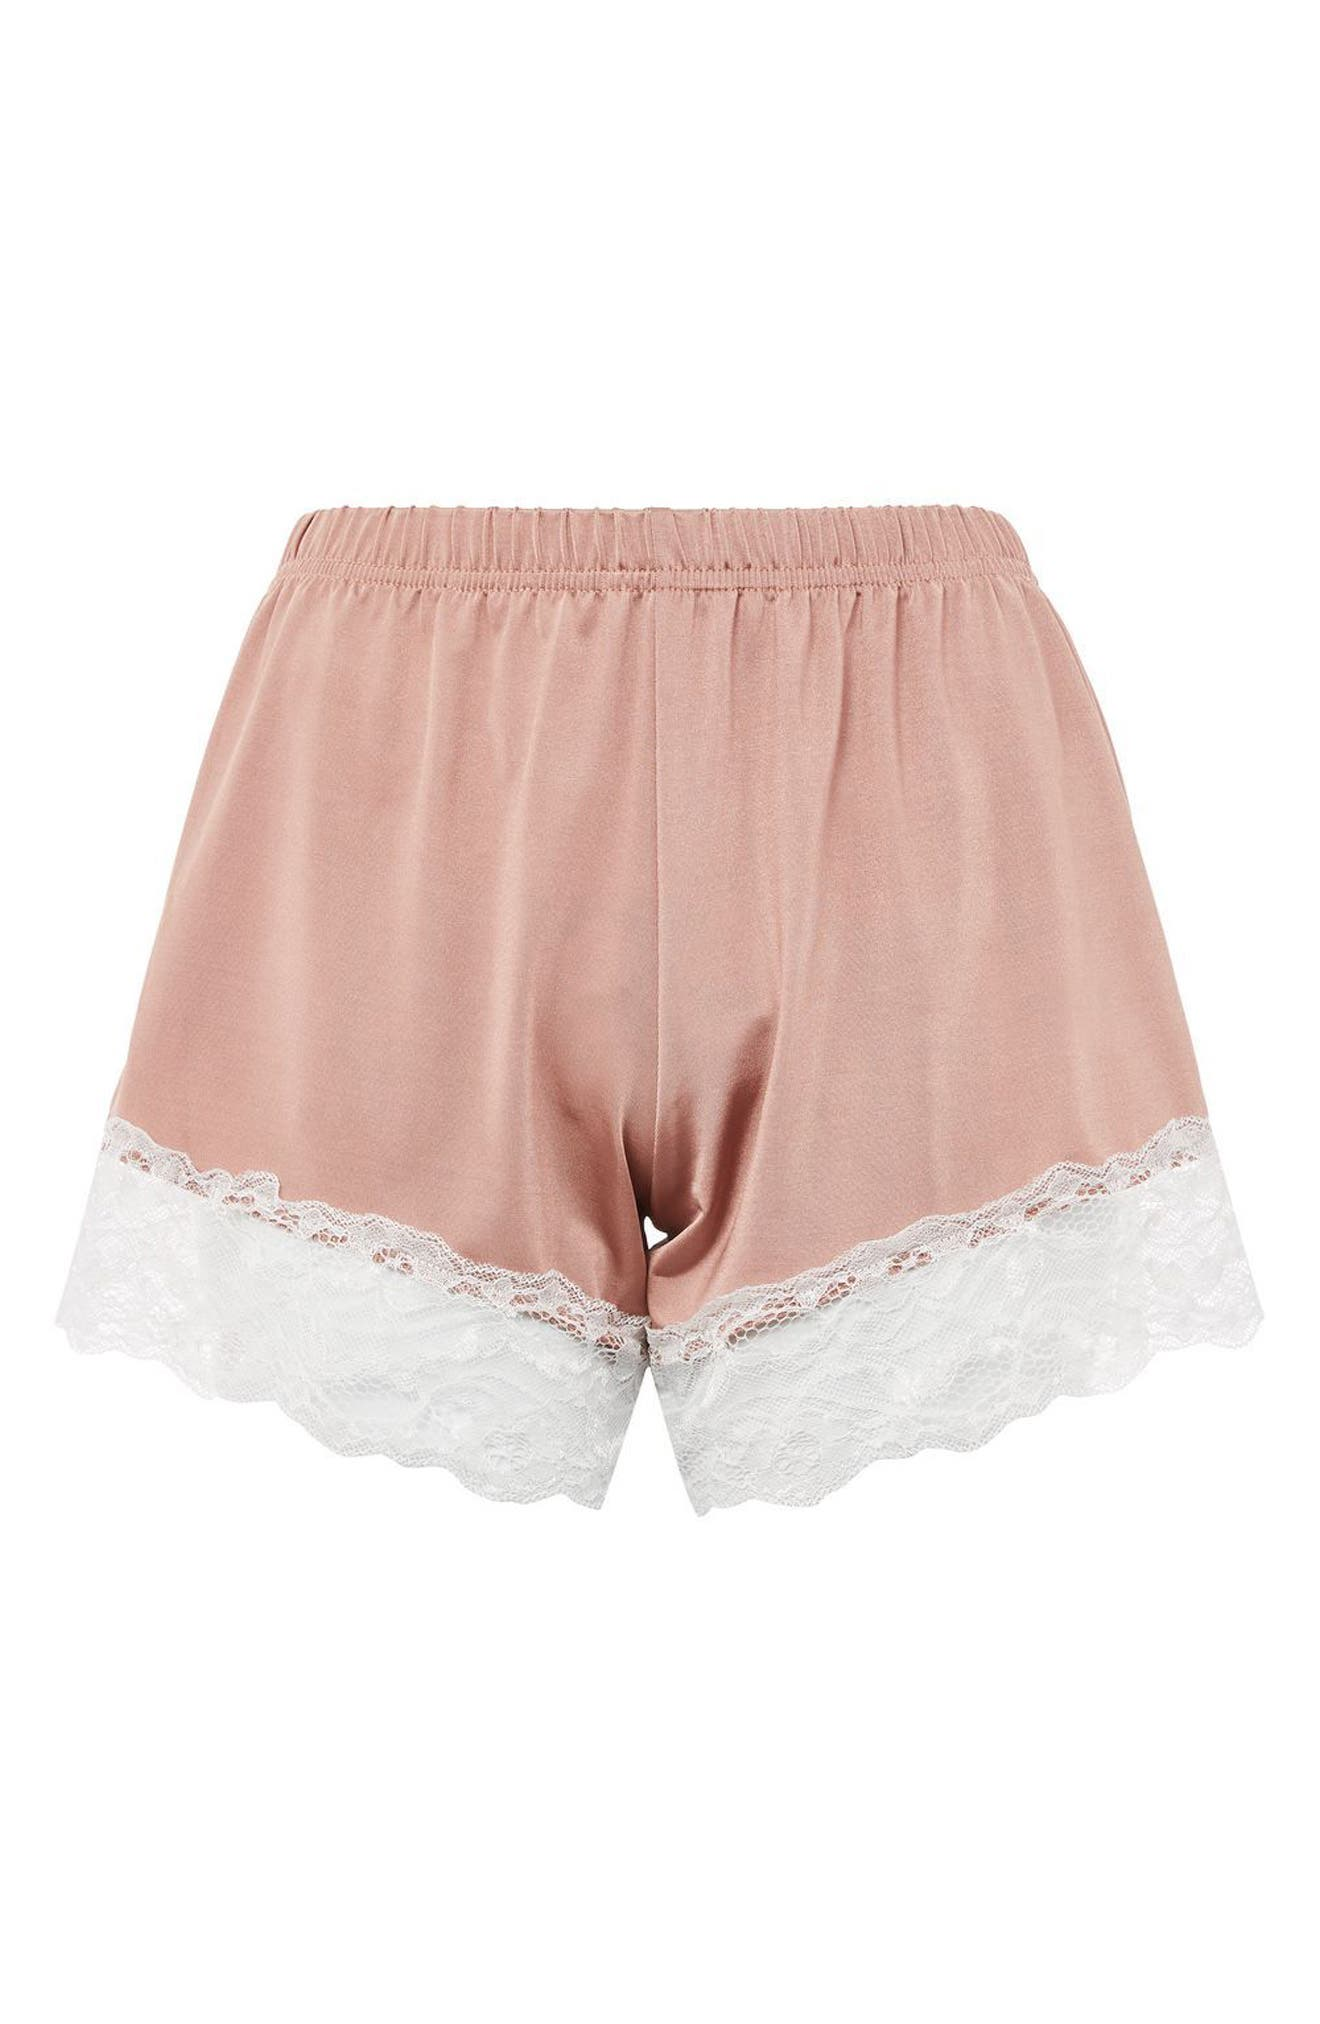 Satin & Lace Pajama Shorts,                             Alternate thumbnail 3, color,                             250